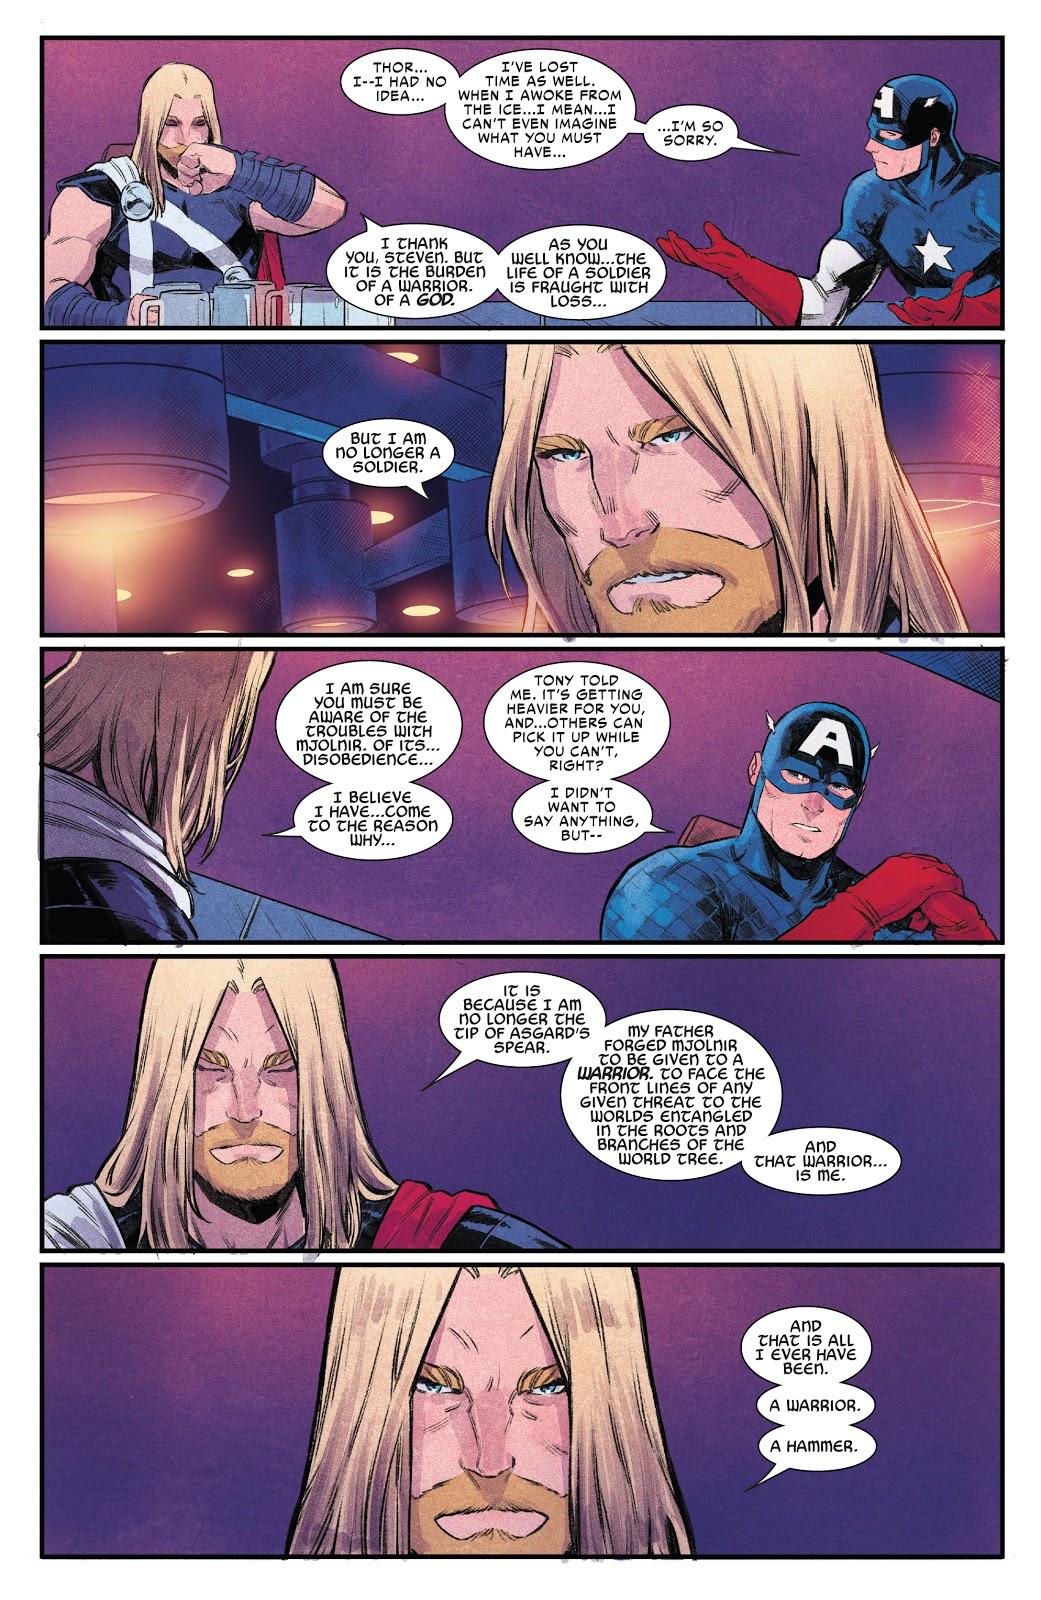 Thor's PTSD In Endgame & MCU Explained In Marvel Comics